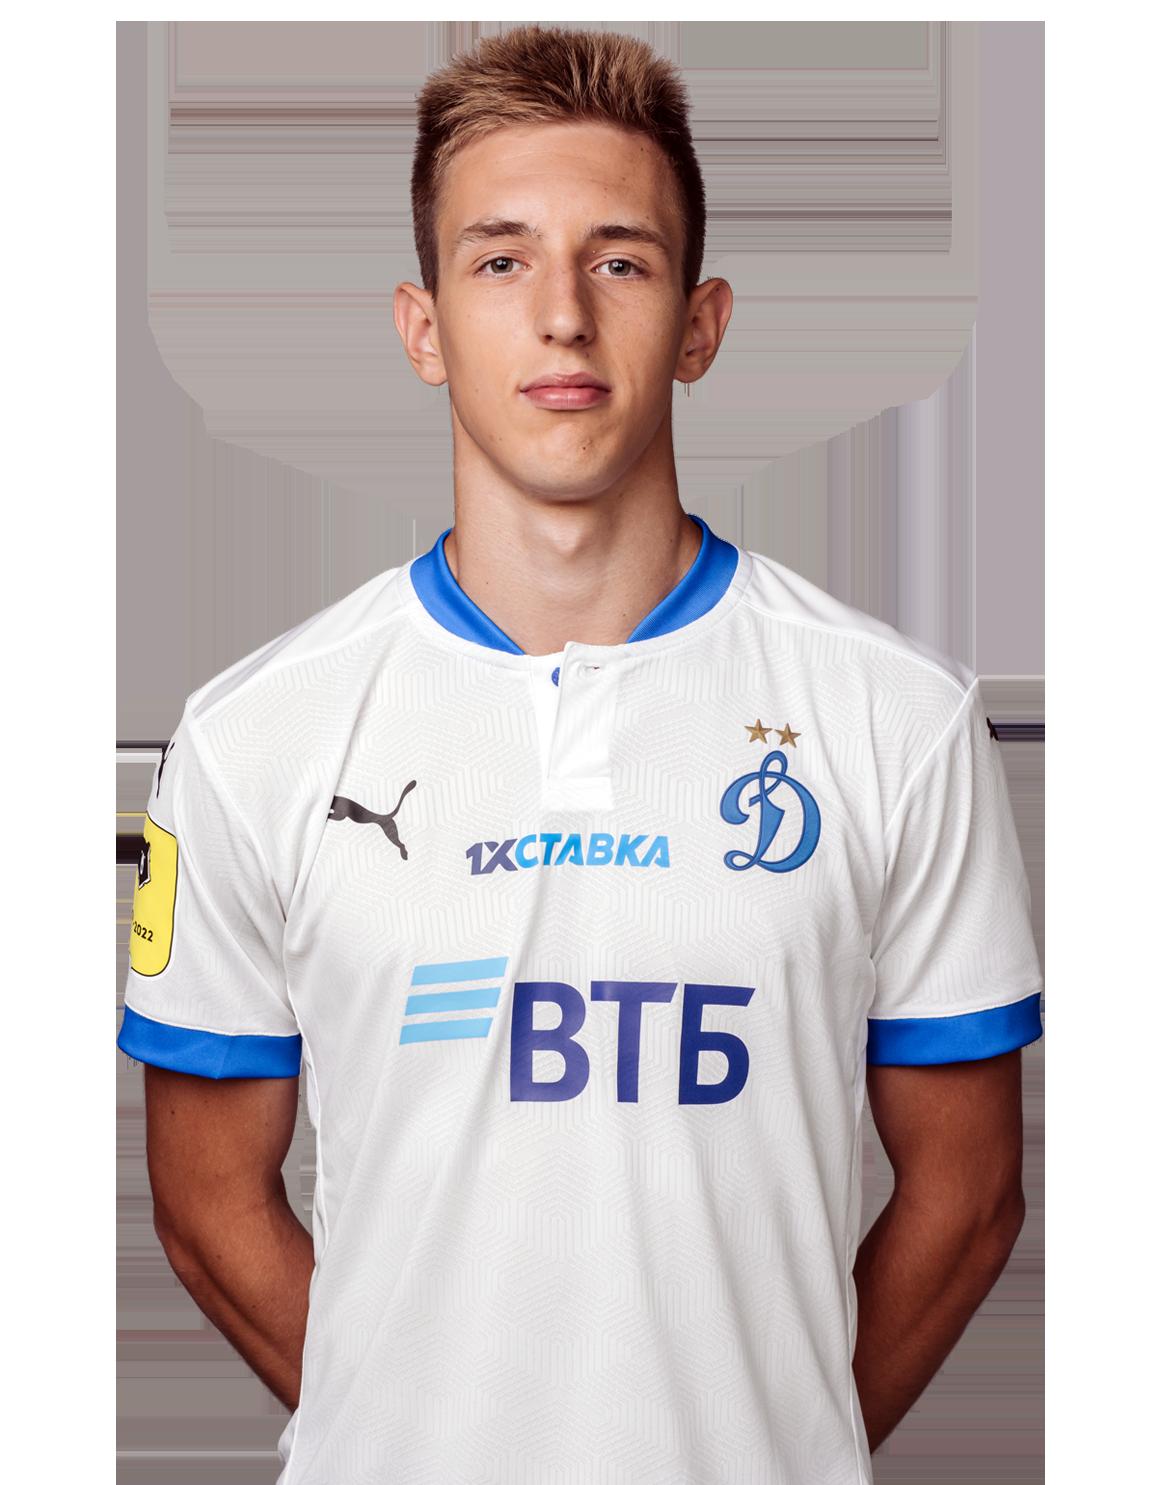 Ярослав Гладышев